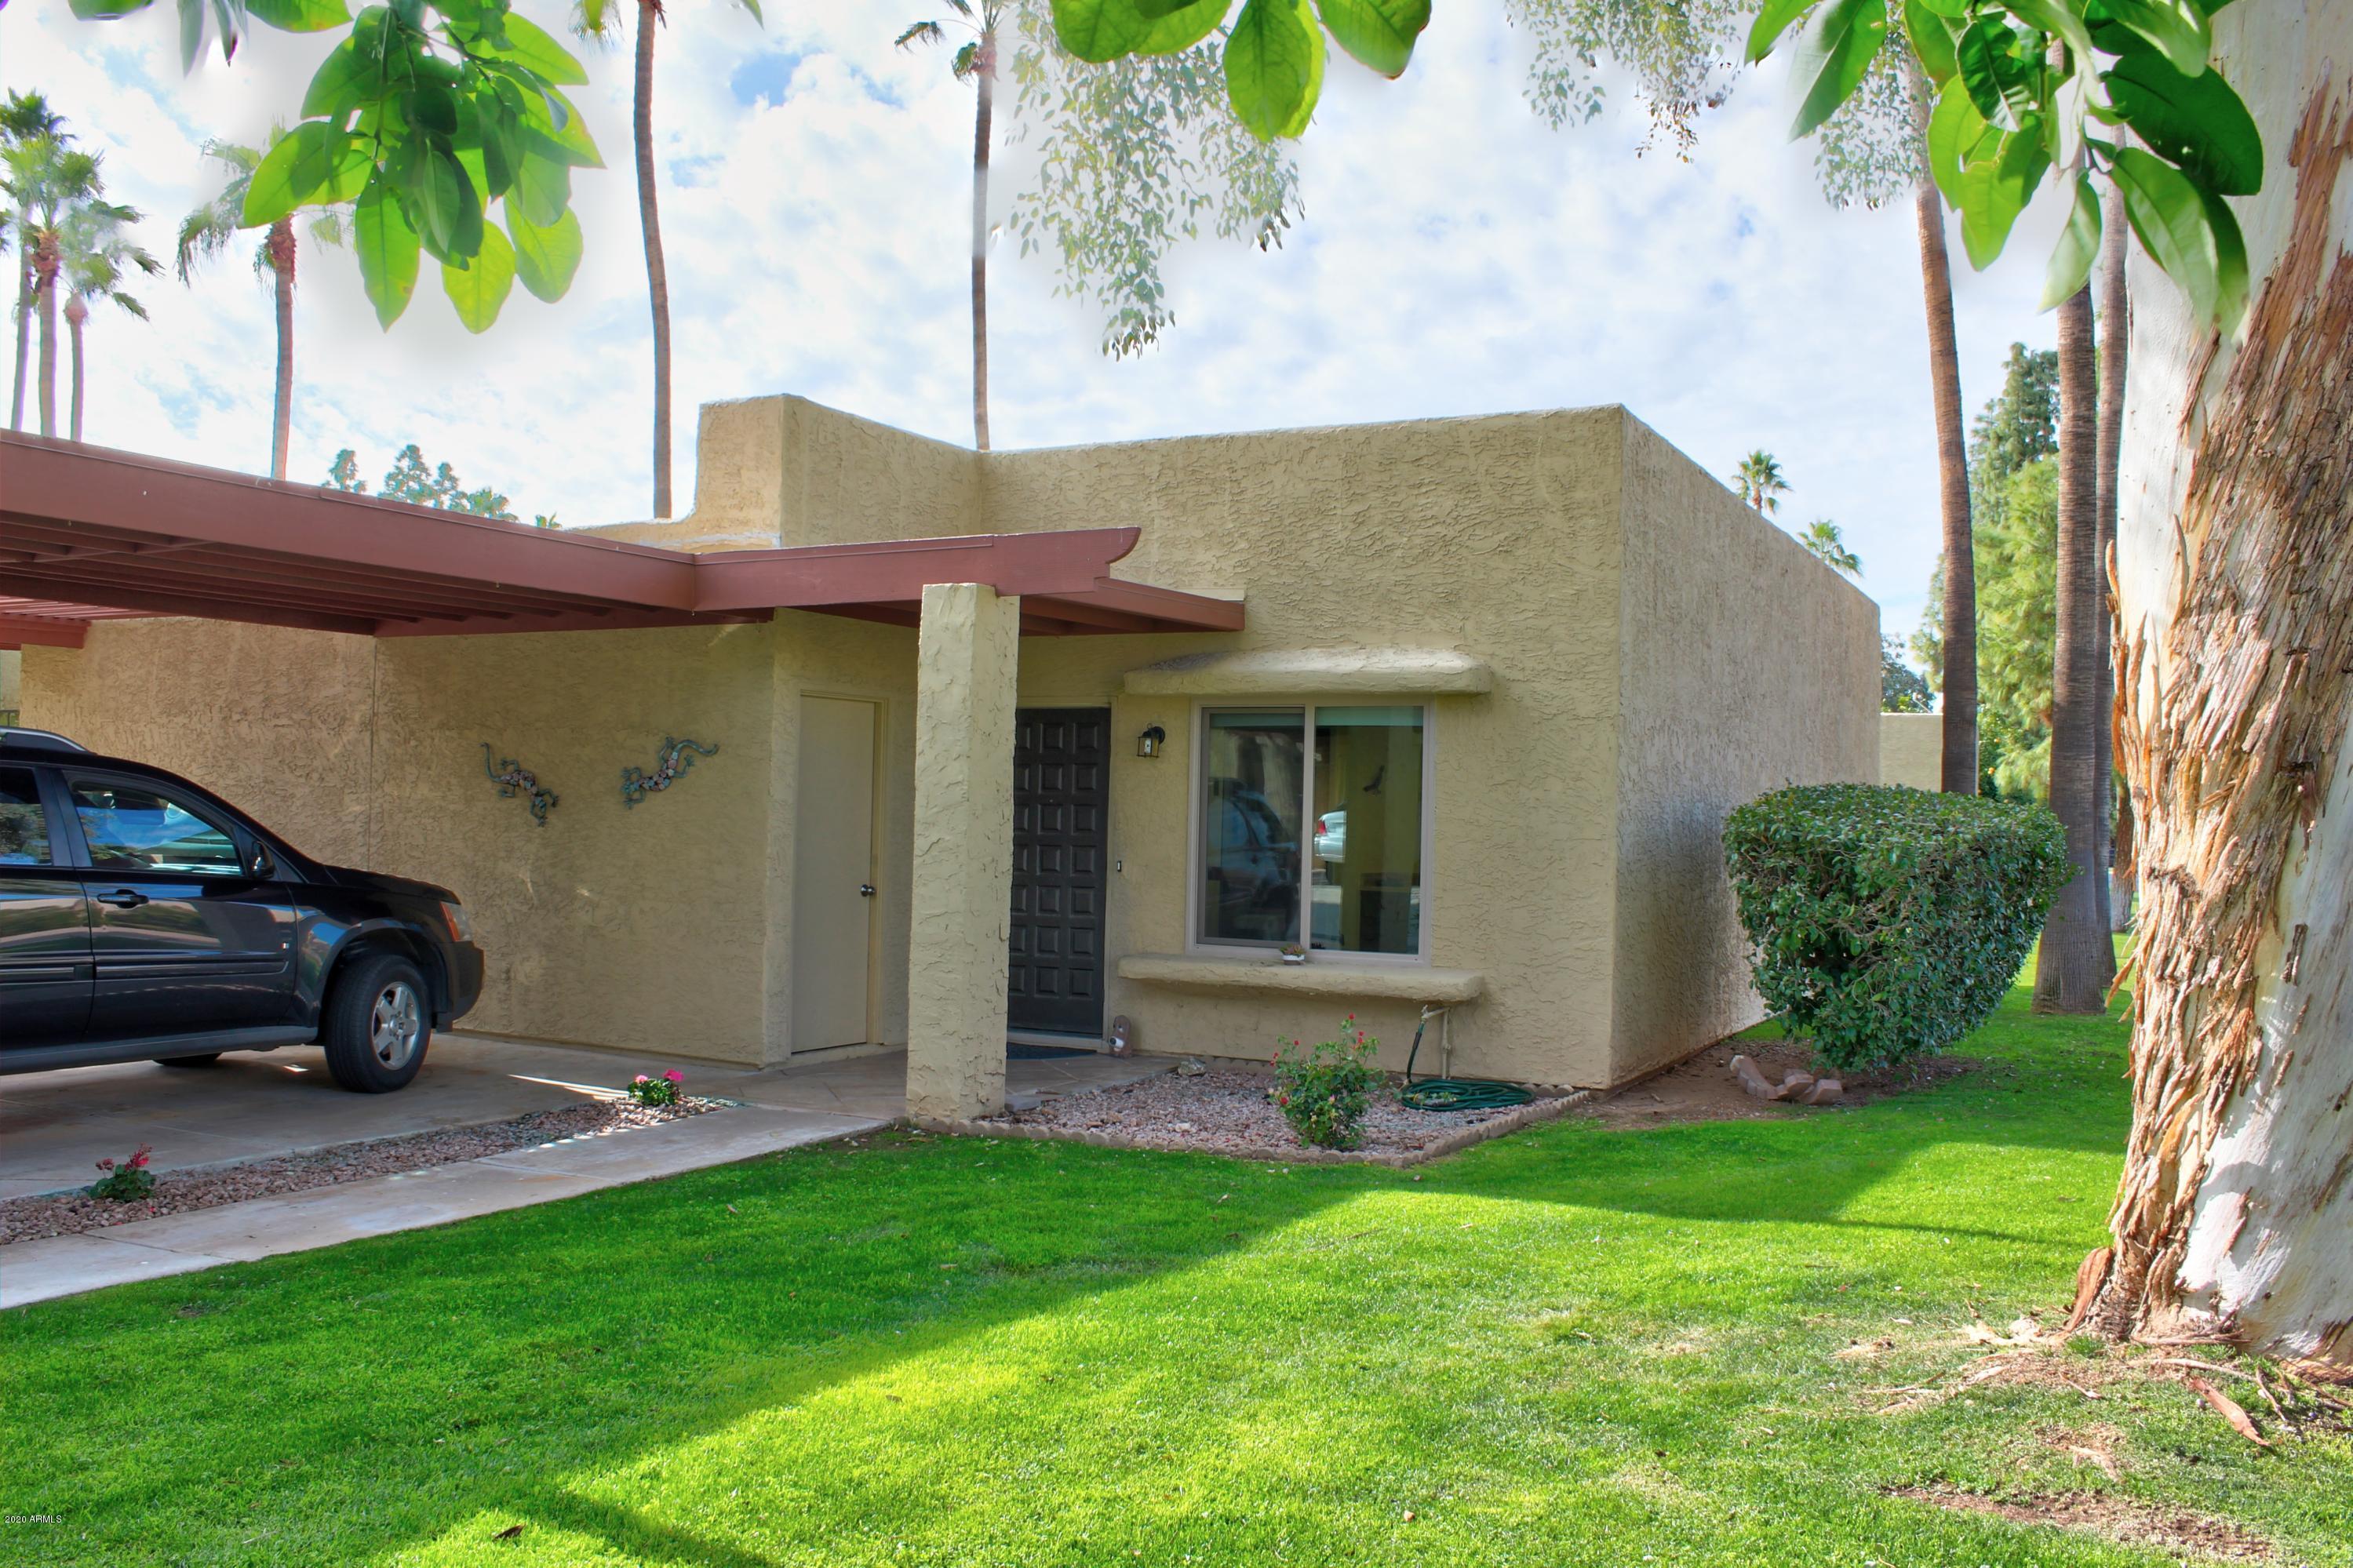 Photo of 504 S PALO VERDE Way, Mesa, AZ 85208